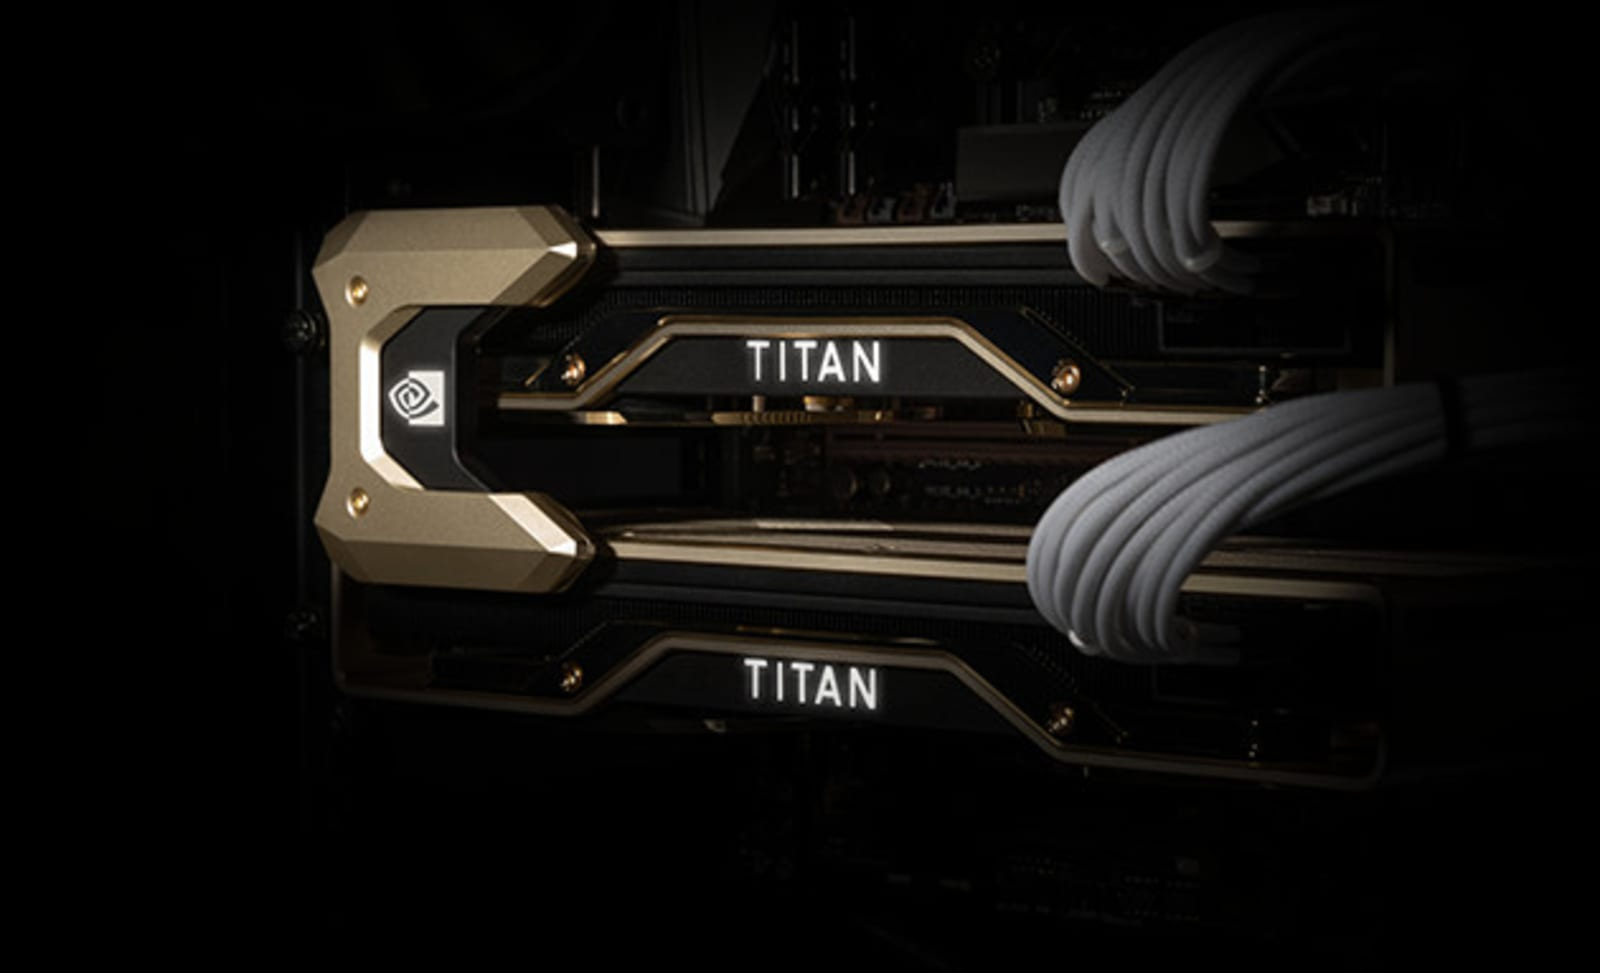 NVIDIA Titan RTX GPU officially launched